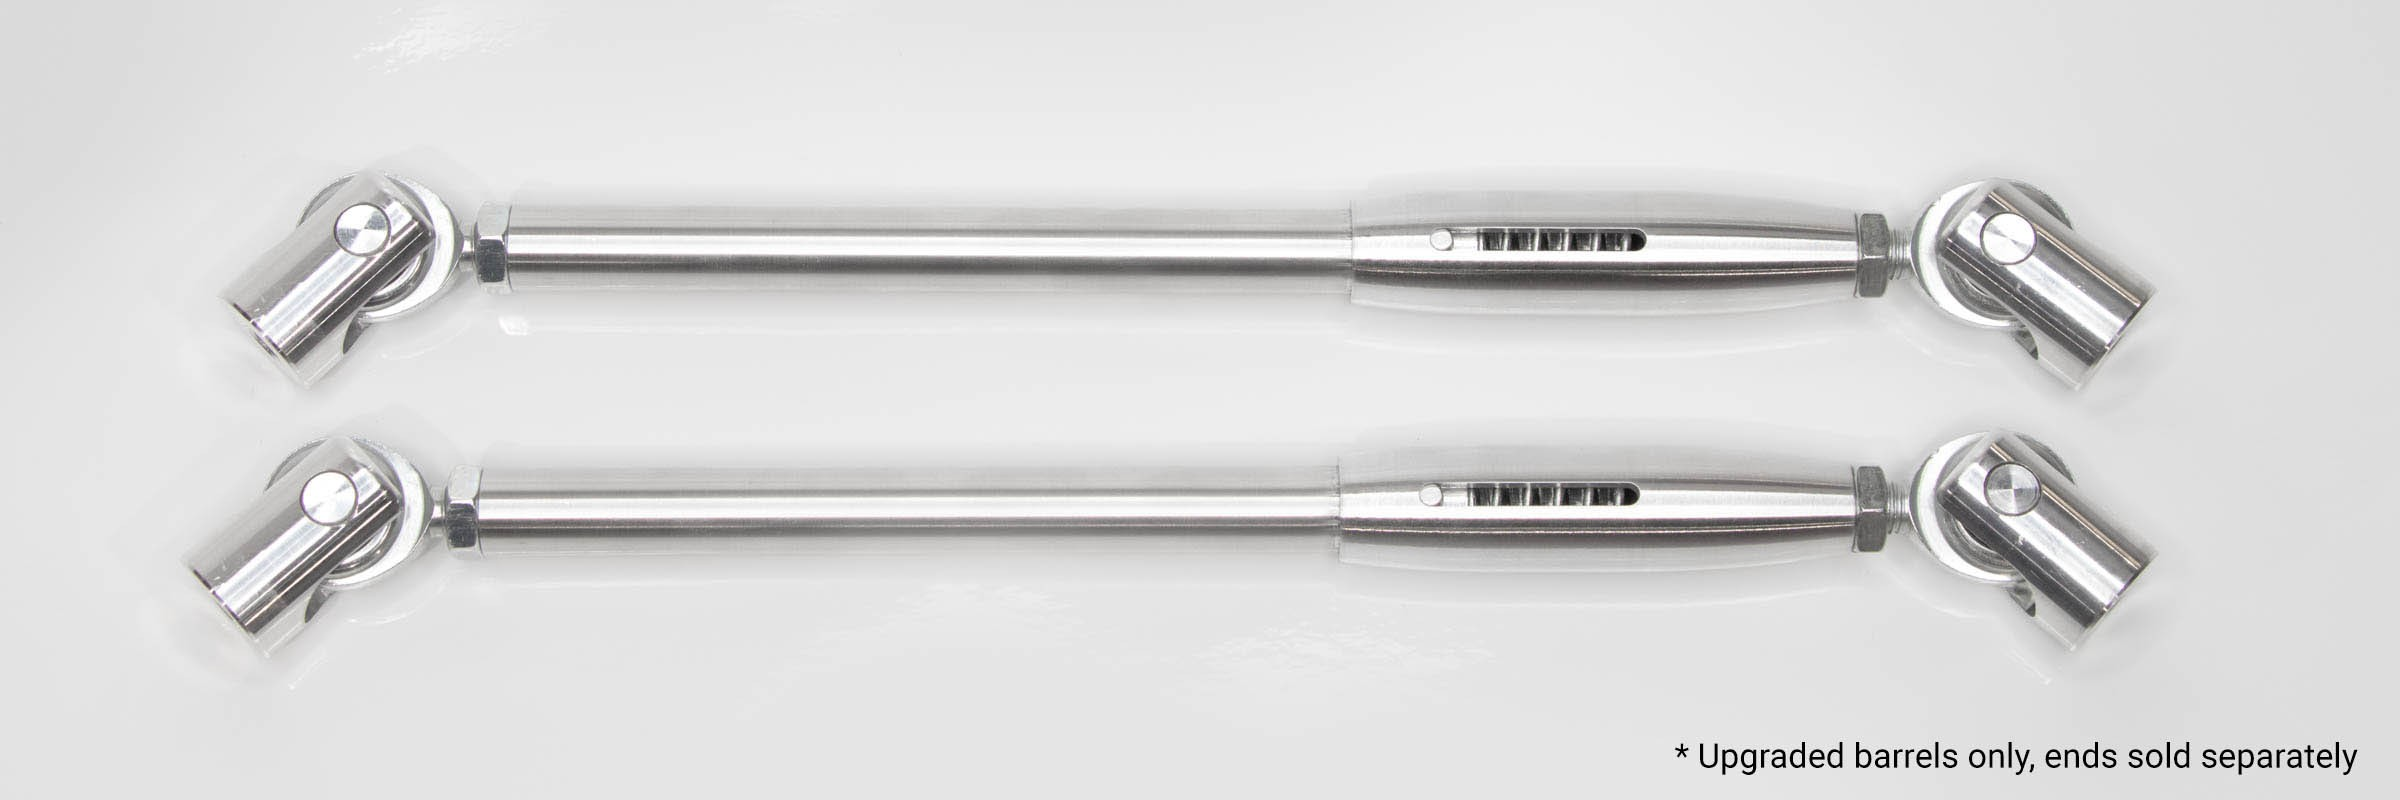 Spring Loaded Splitter Support Rod Upgrade